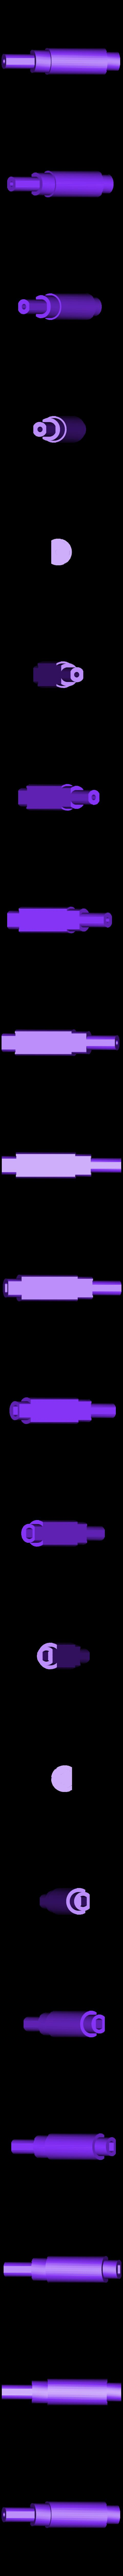 36-alternative_rear_axle_x2.stl Download free STL file OpenRC Tractor • 3D printable object, makitpro